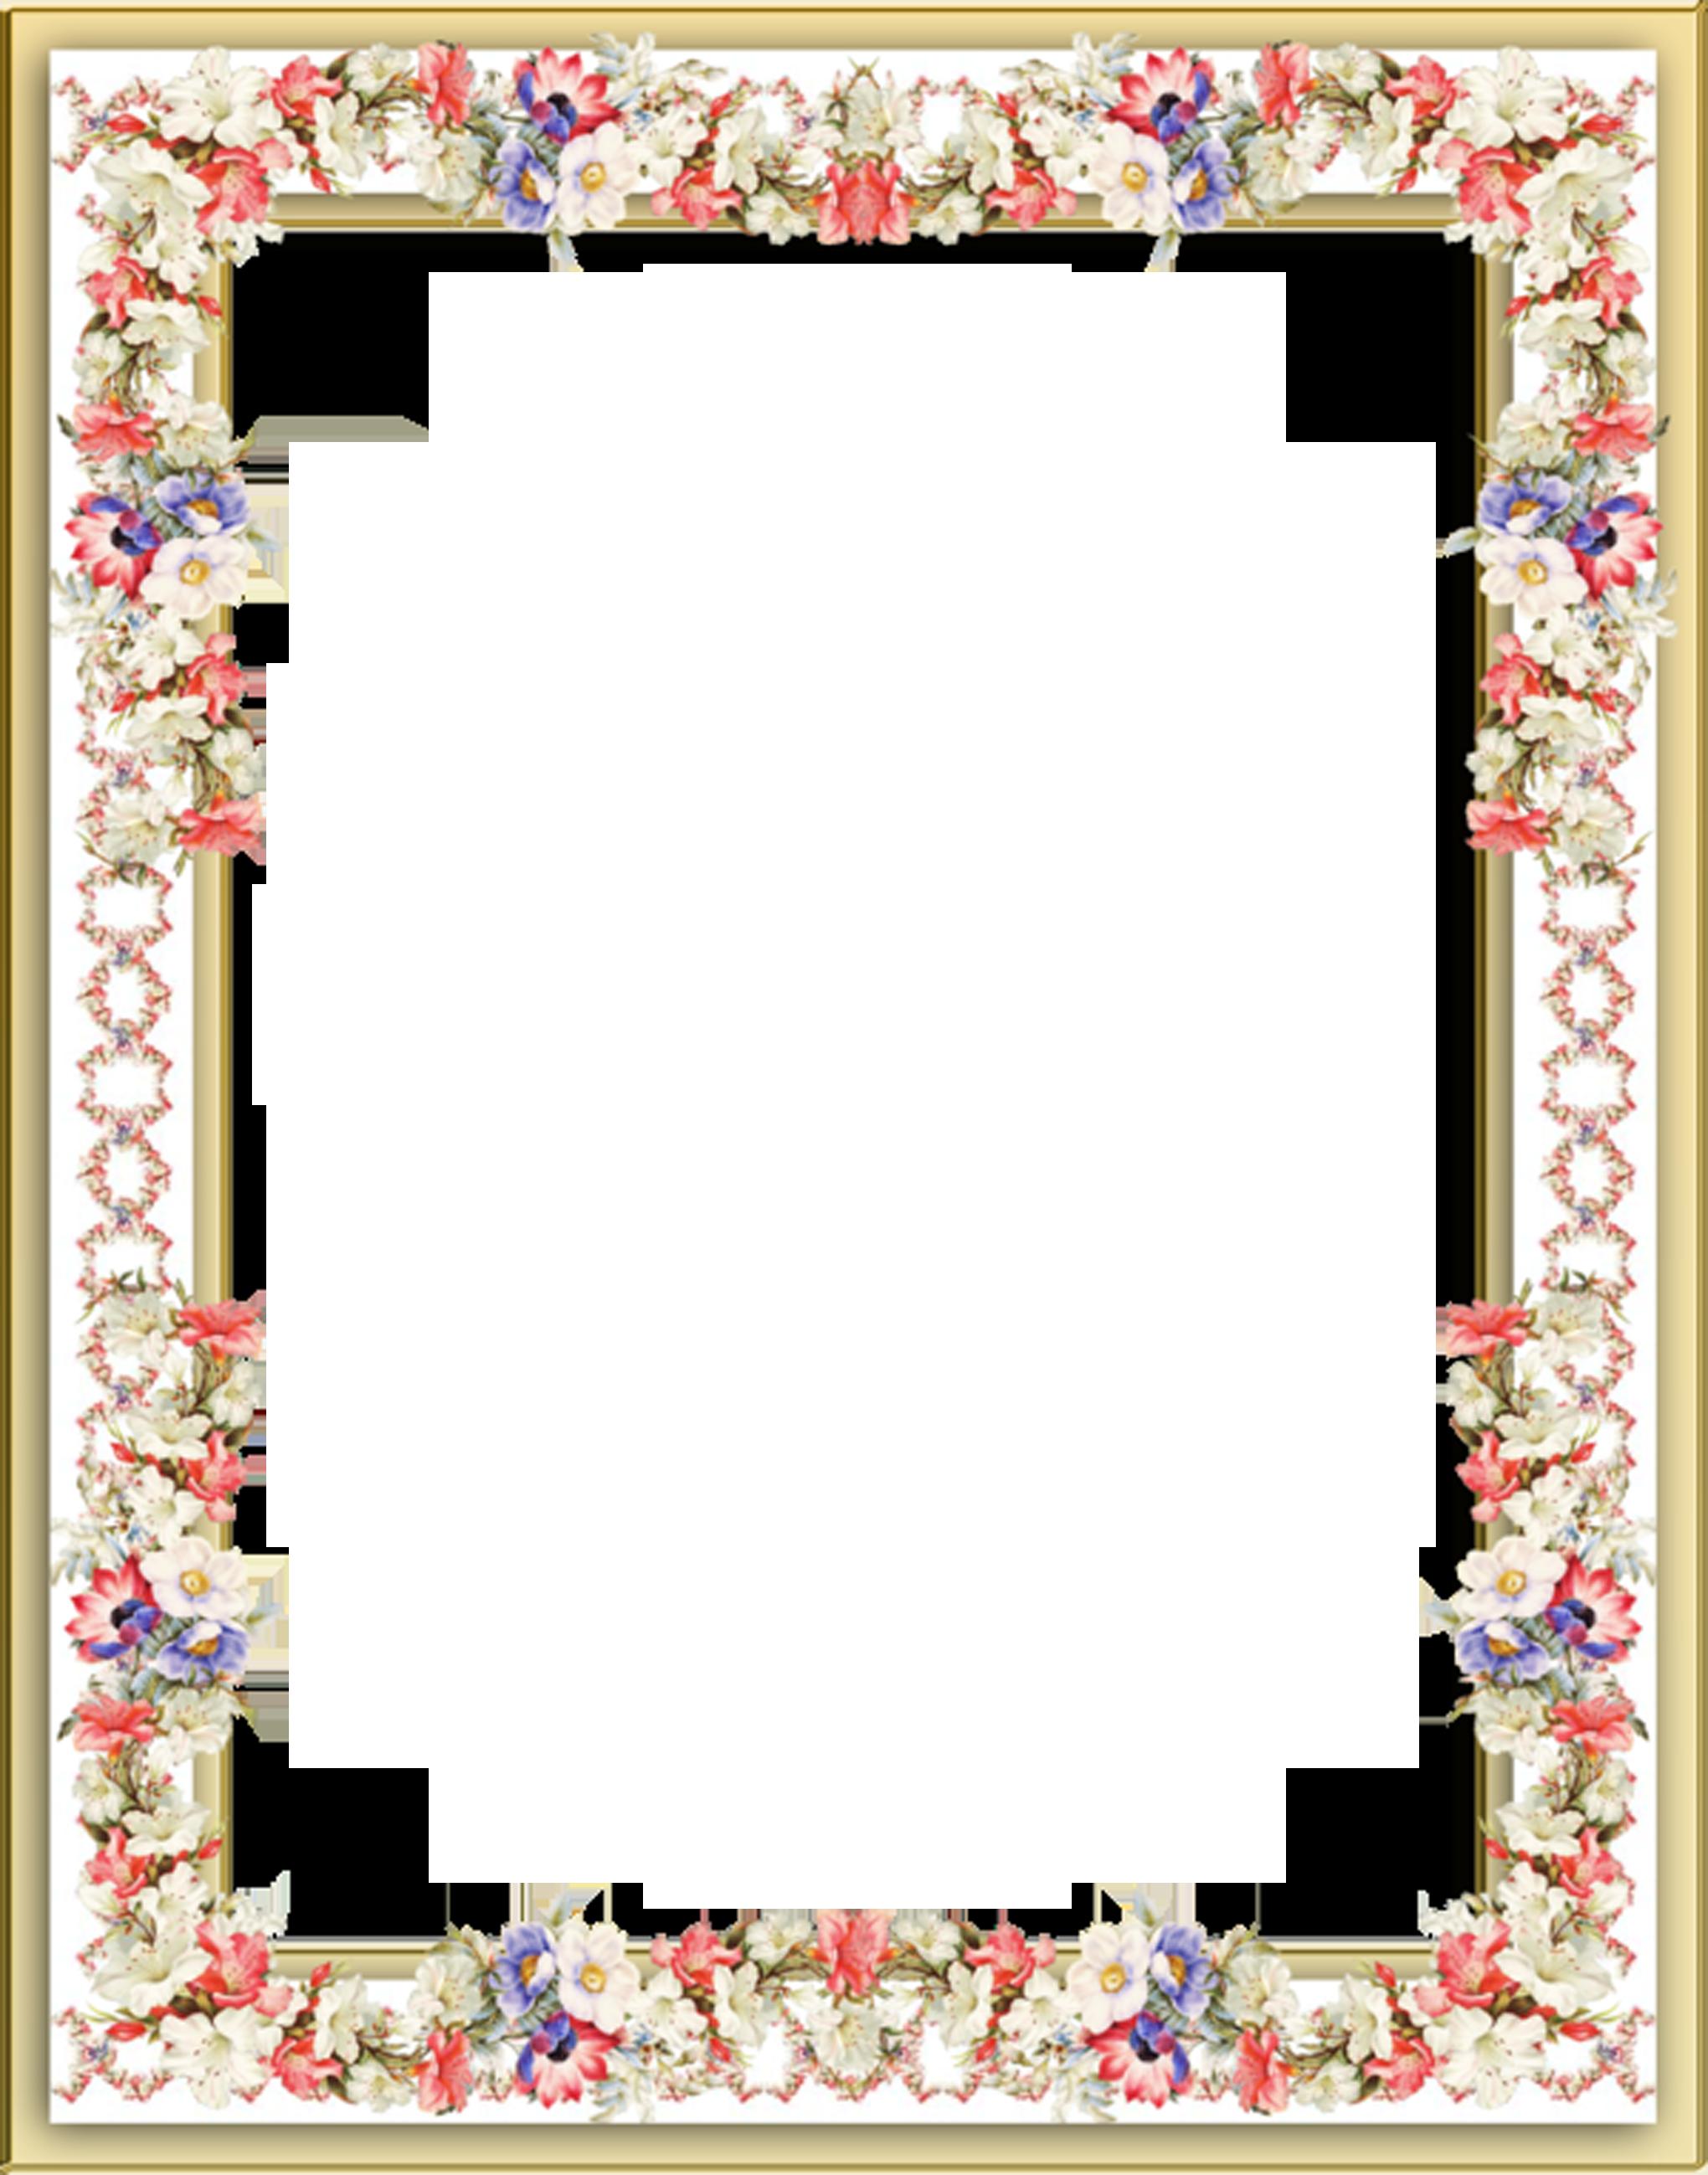 Строгая рамка фото с цветами